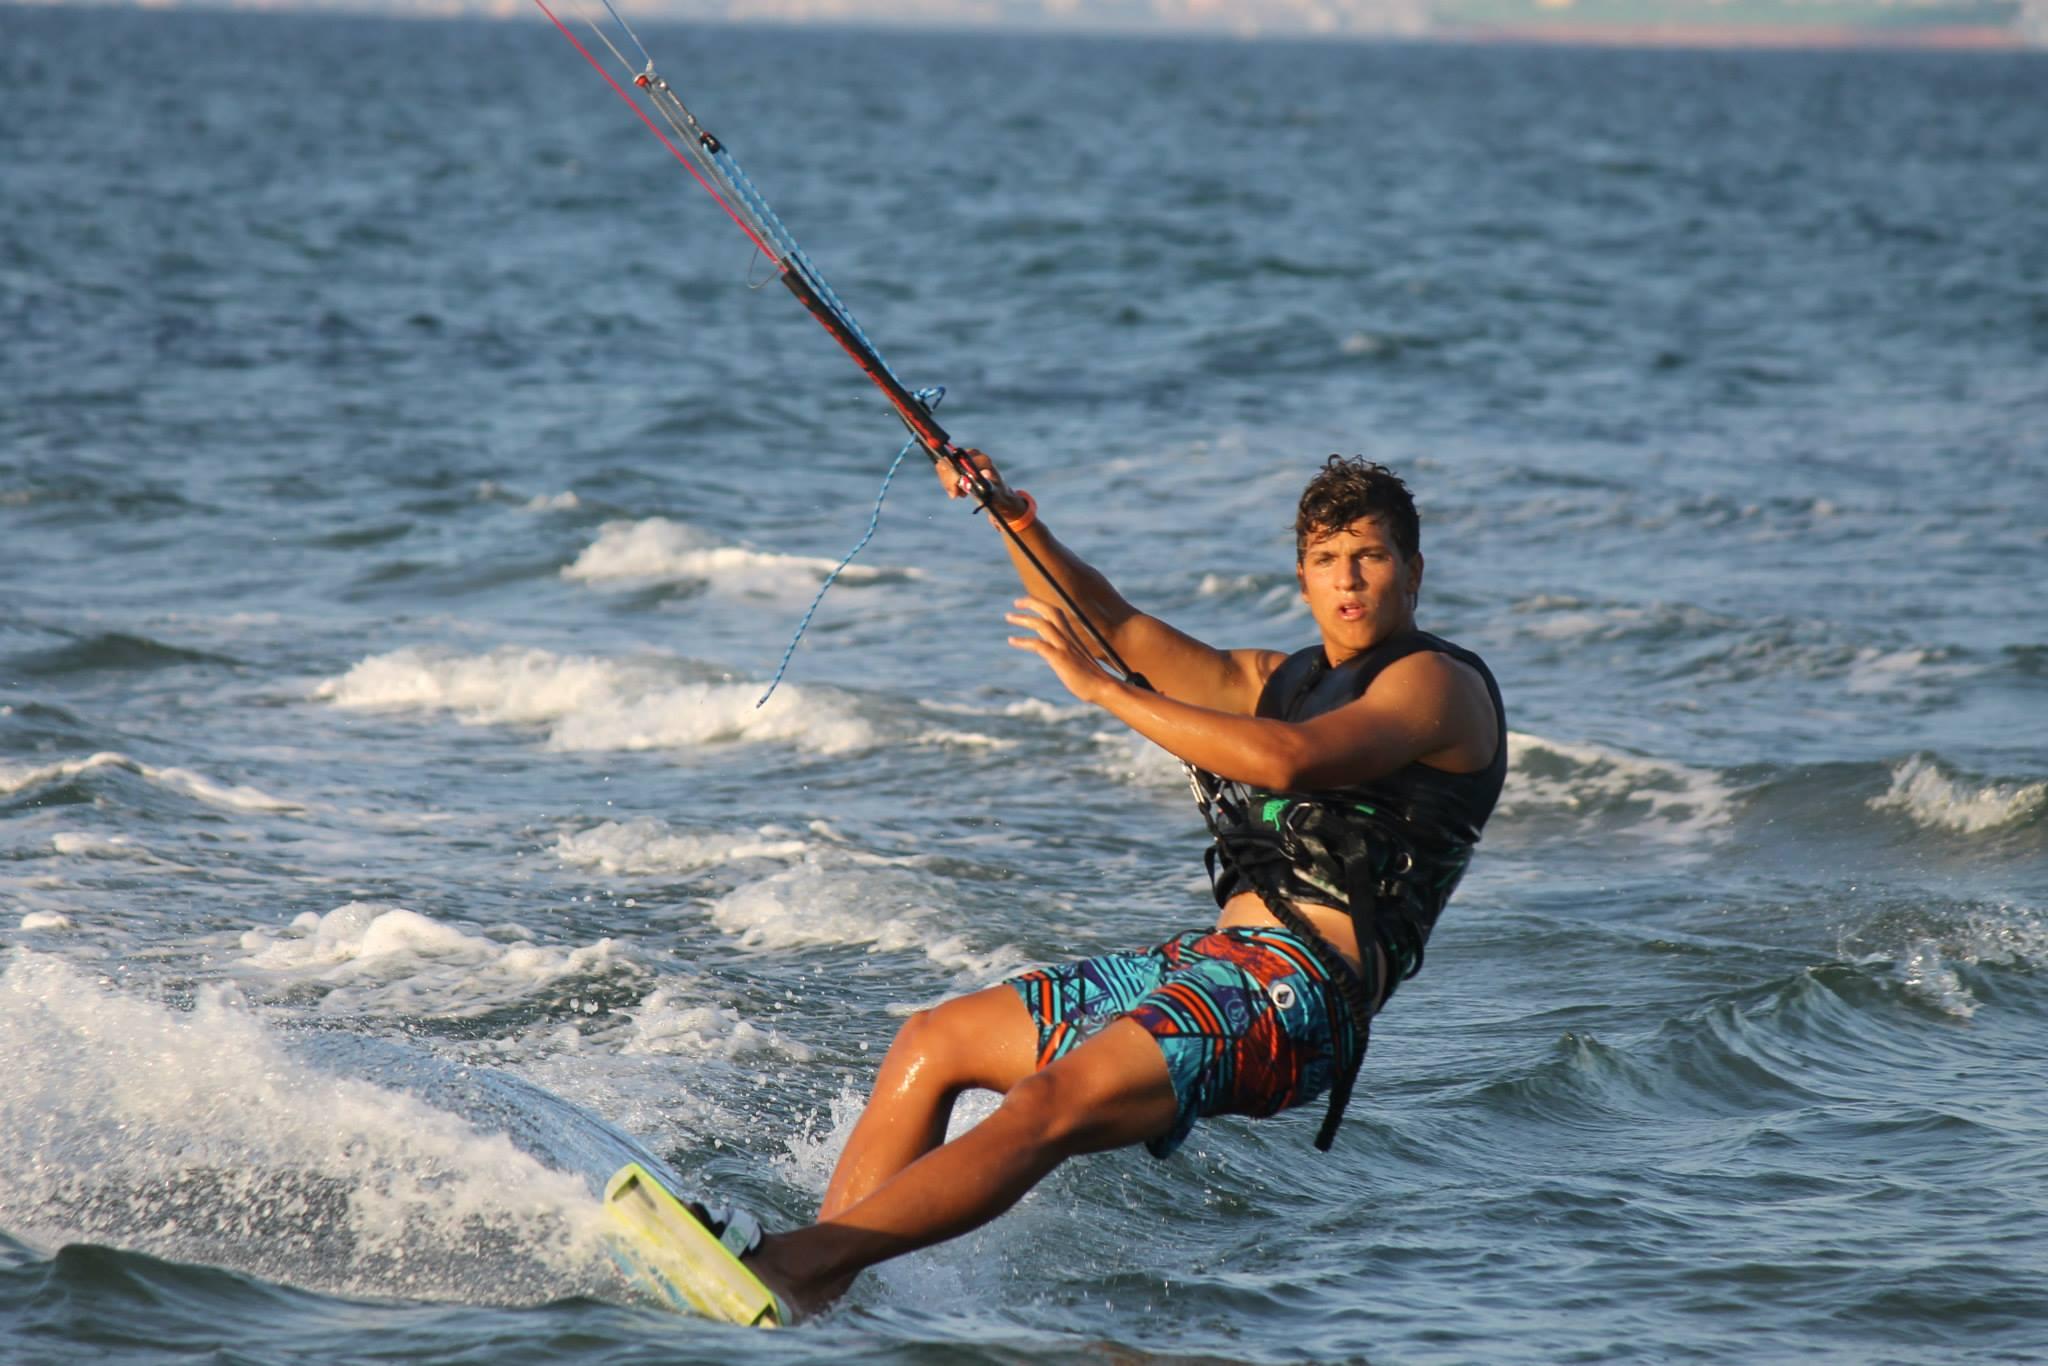 Kitesurfing La Maddalena Spiaggia Petrol Beach August 2014